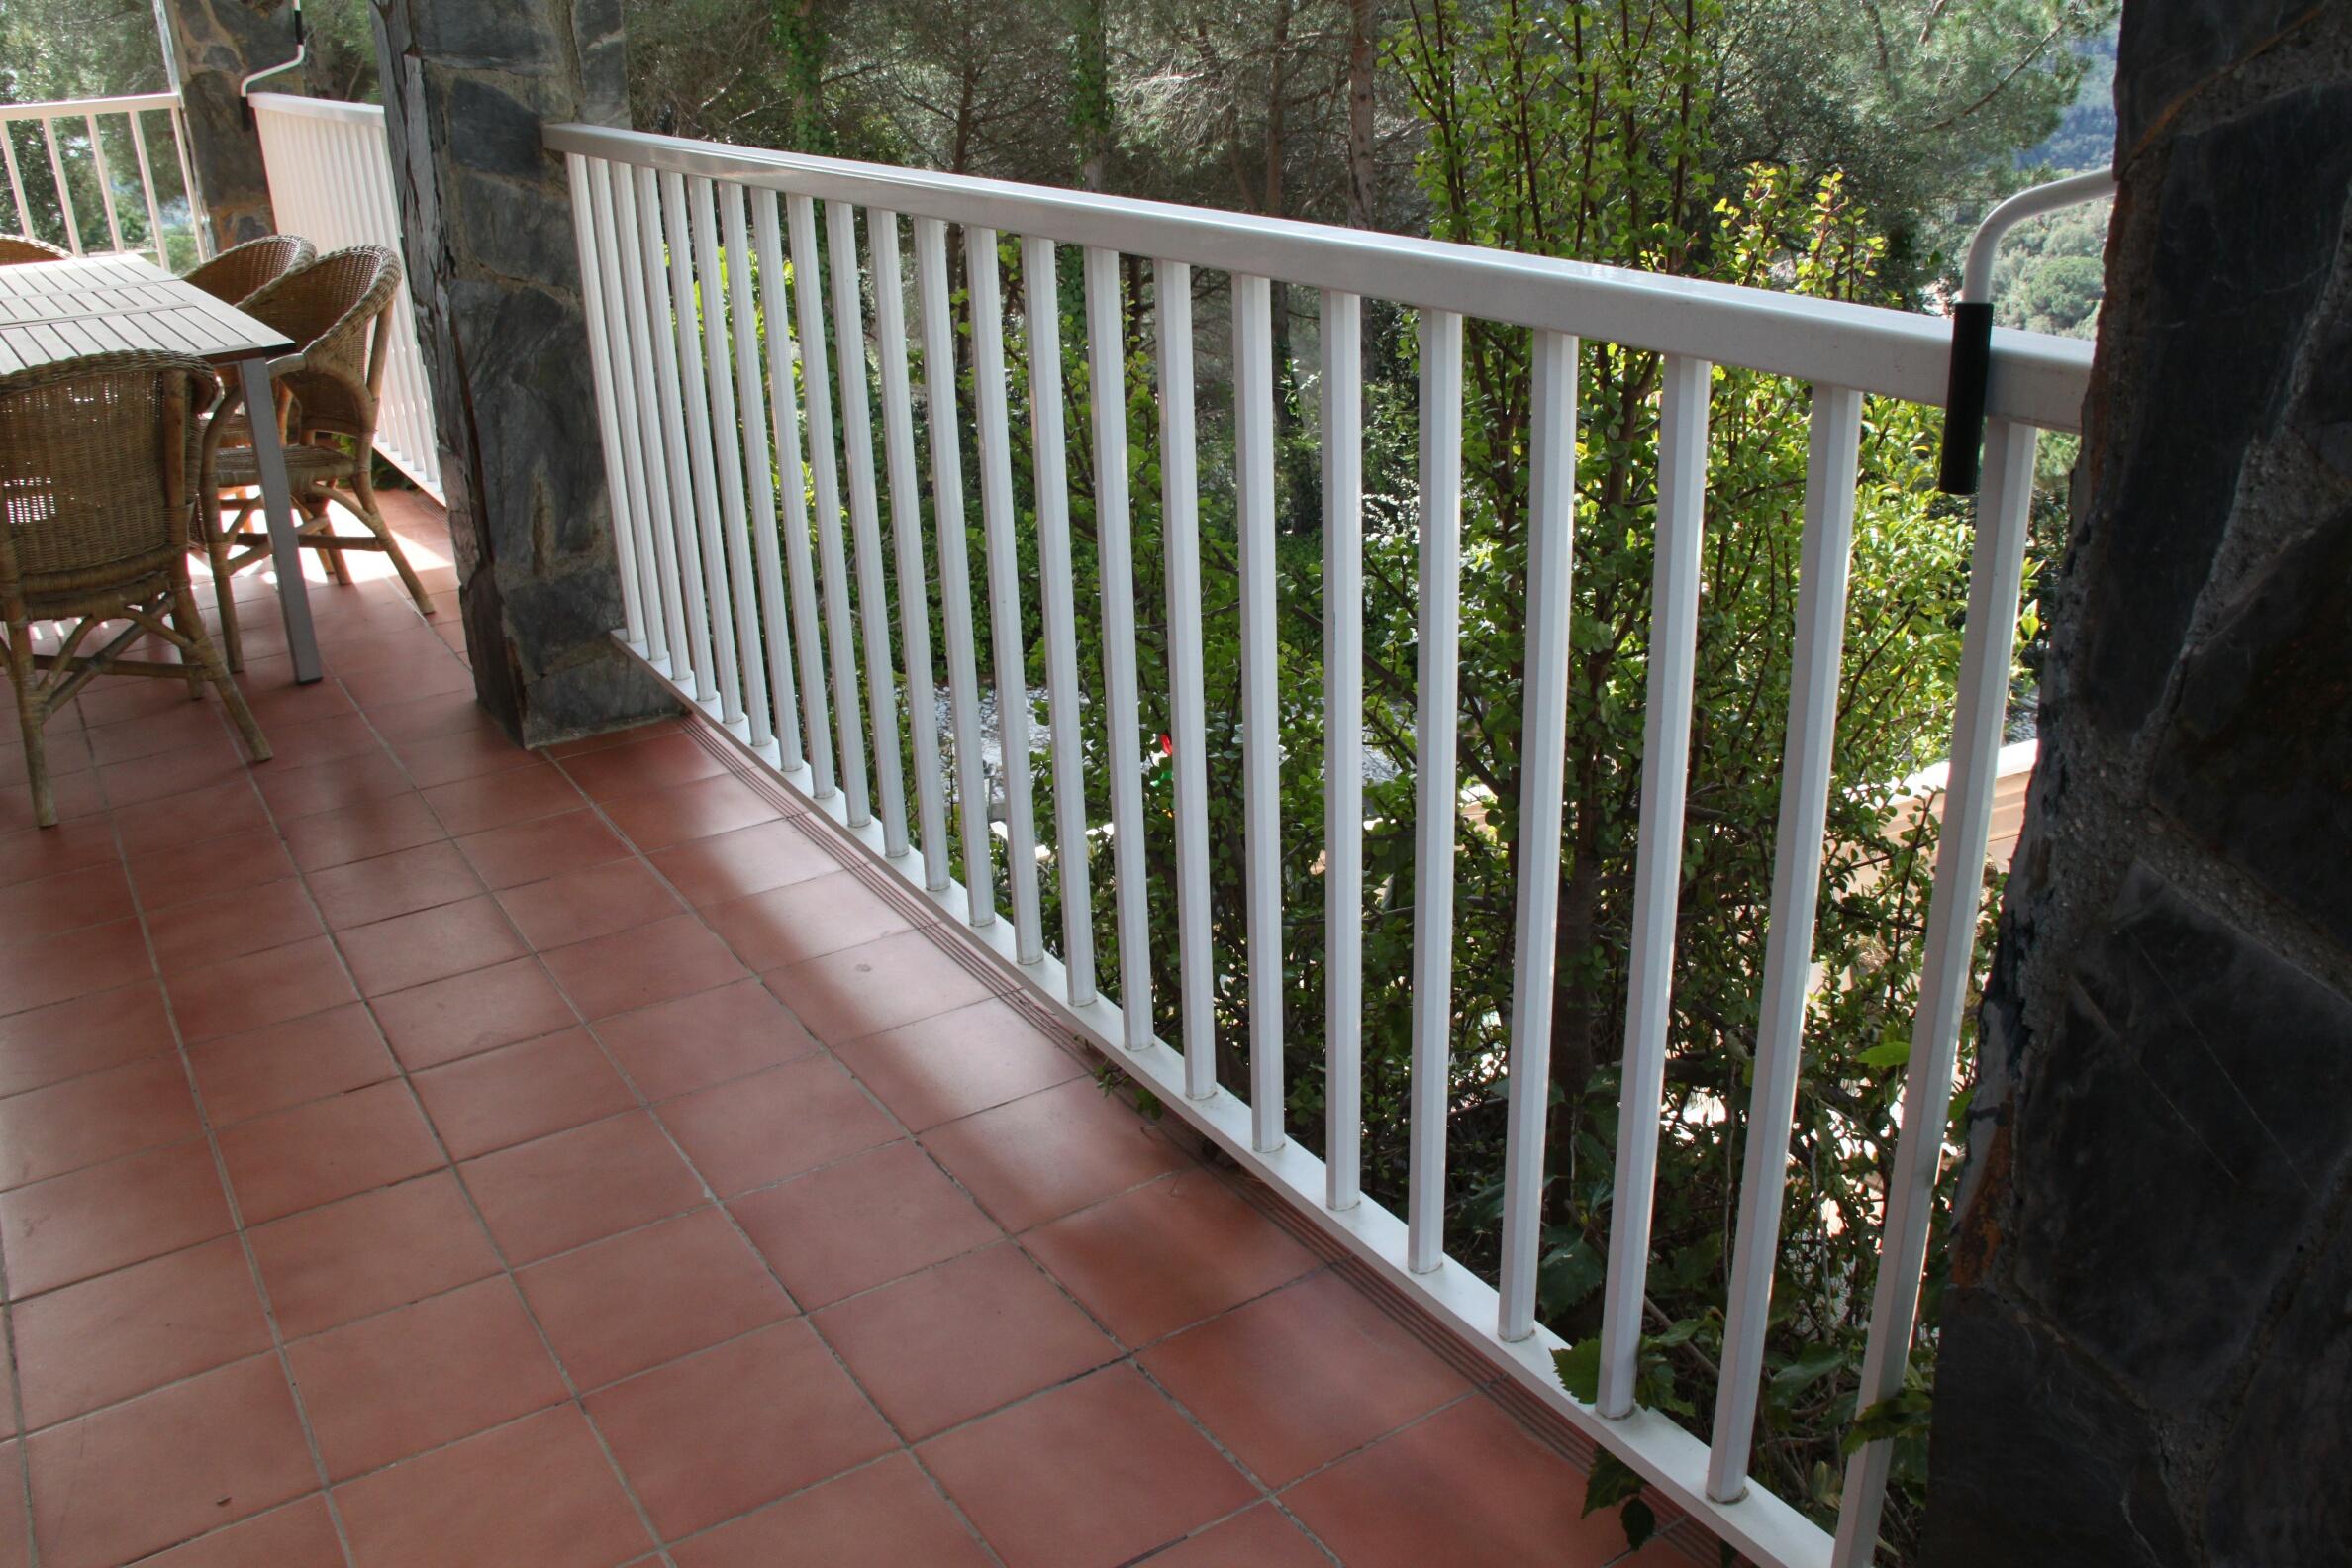 Barandillas de aluminio en alumisol - Barandas de terrazas ...